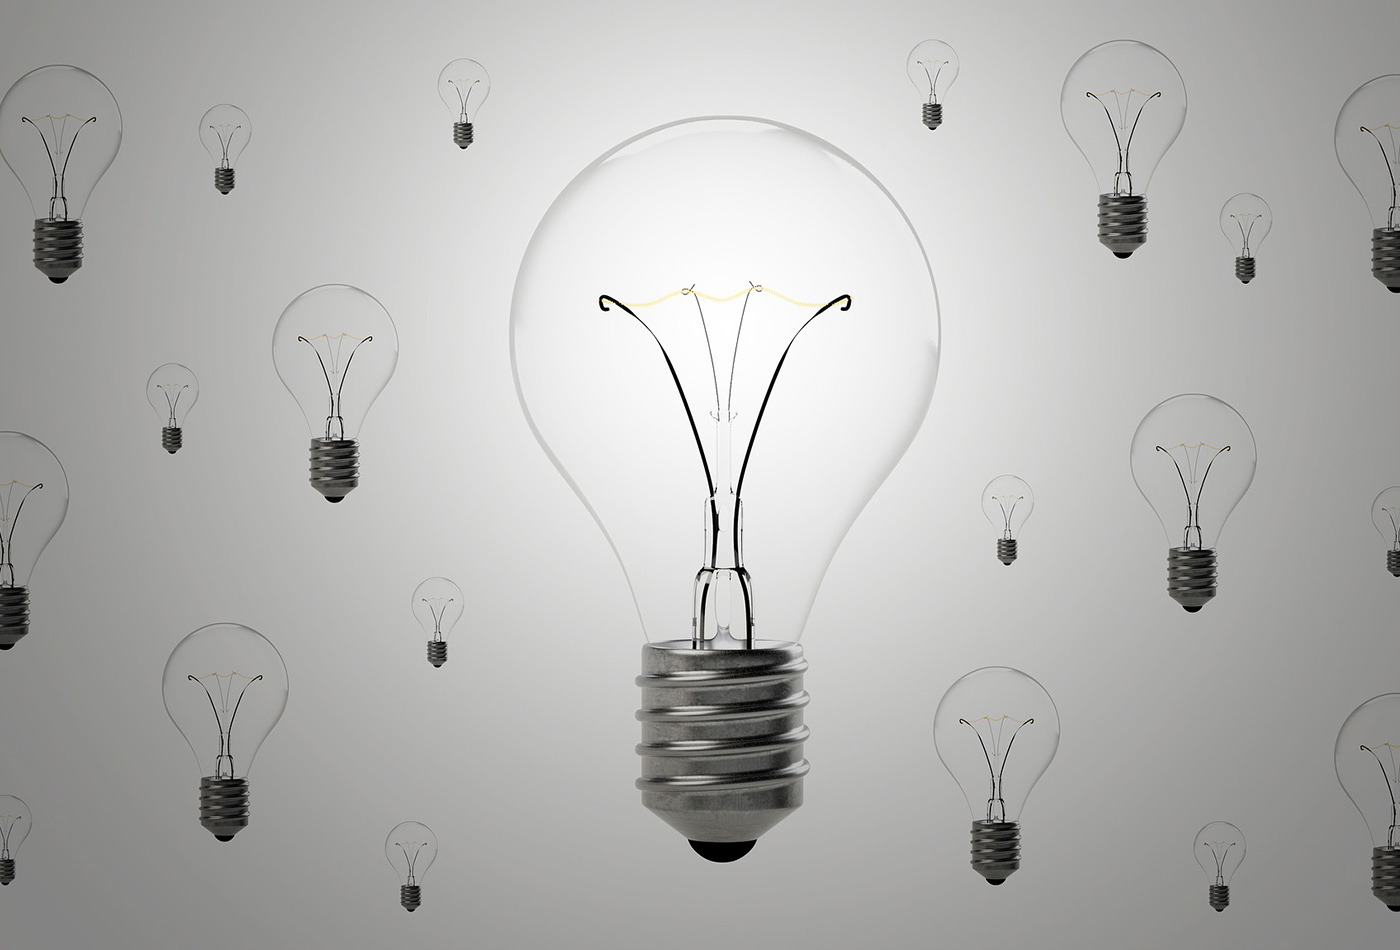 Lightbulbs.